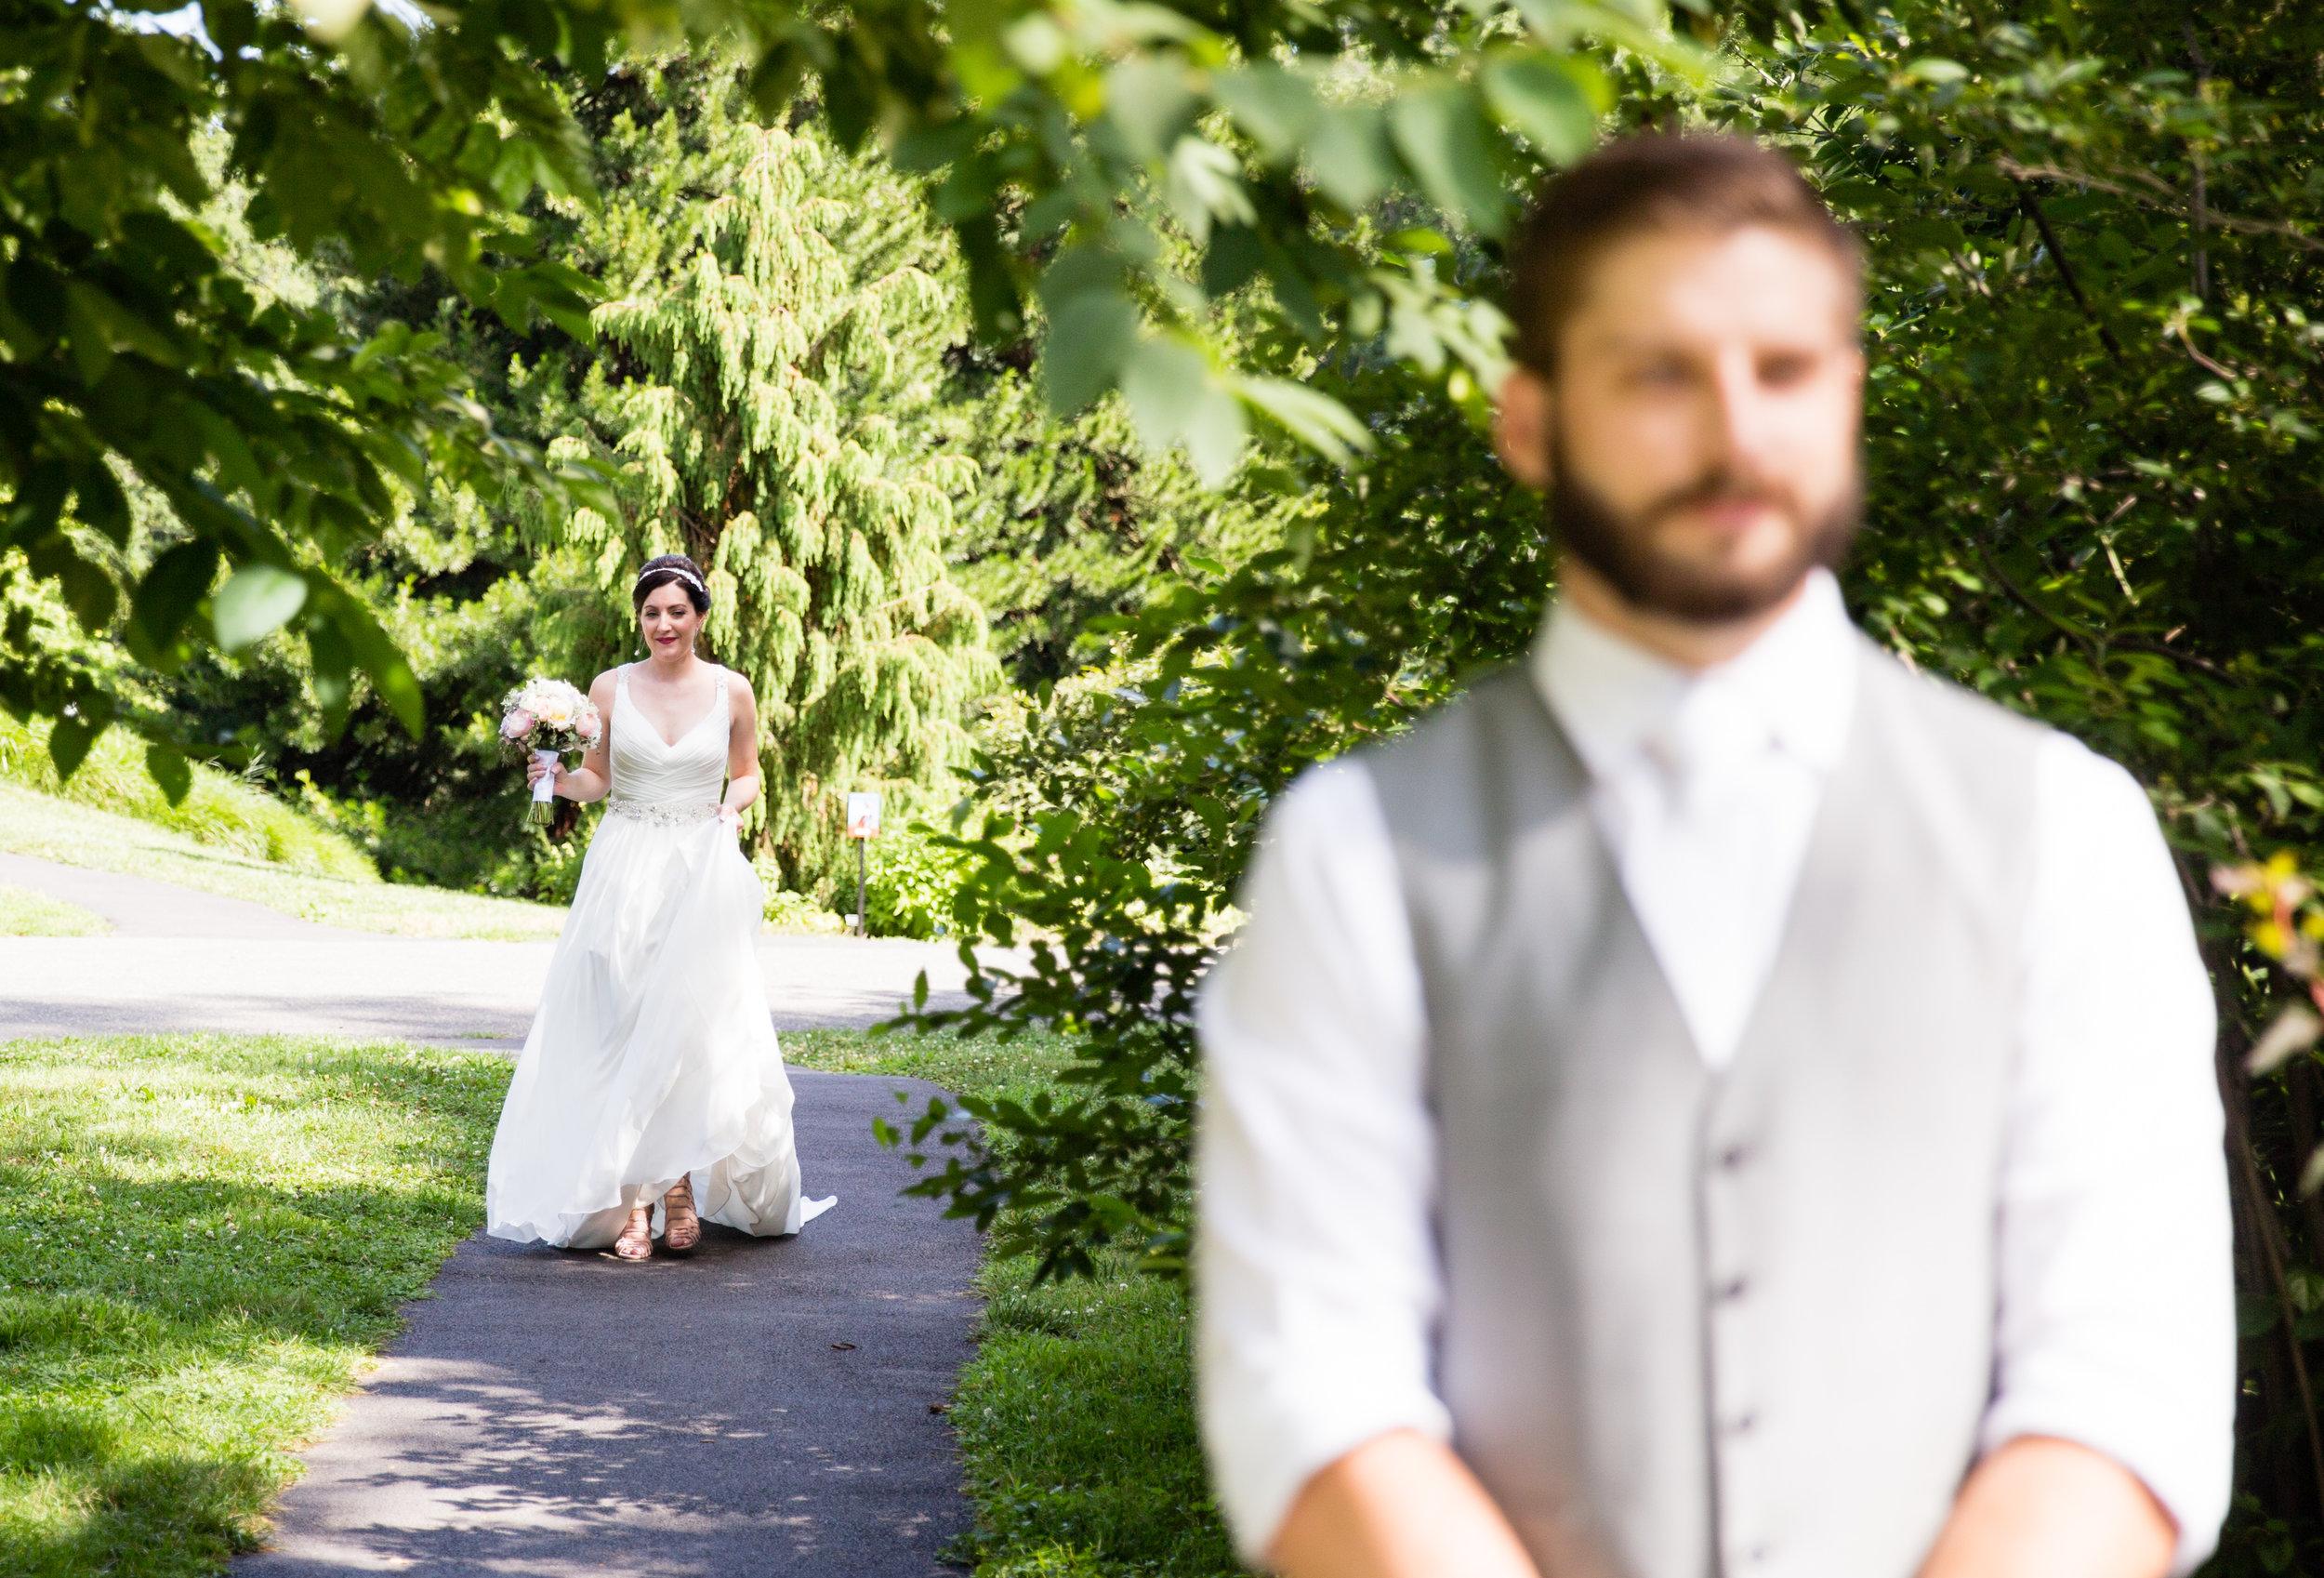 TYLER ARBORETUM WEDDING PHOTOGRAPHY LOVESTRUCK PICTURES-012.jpg